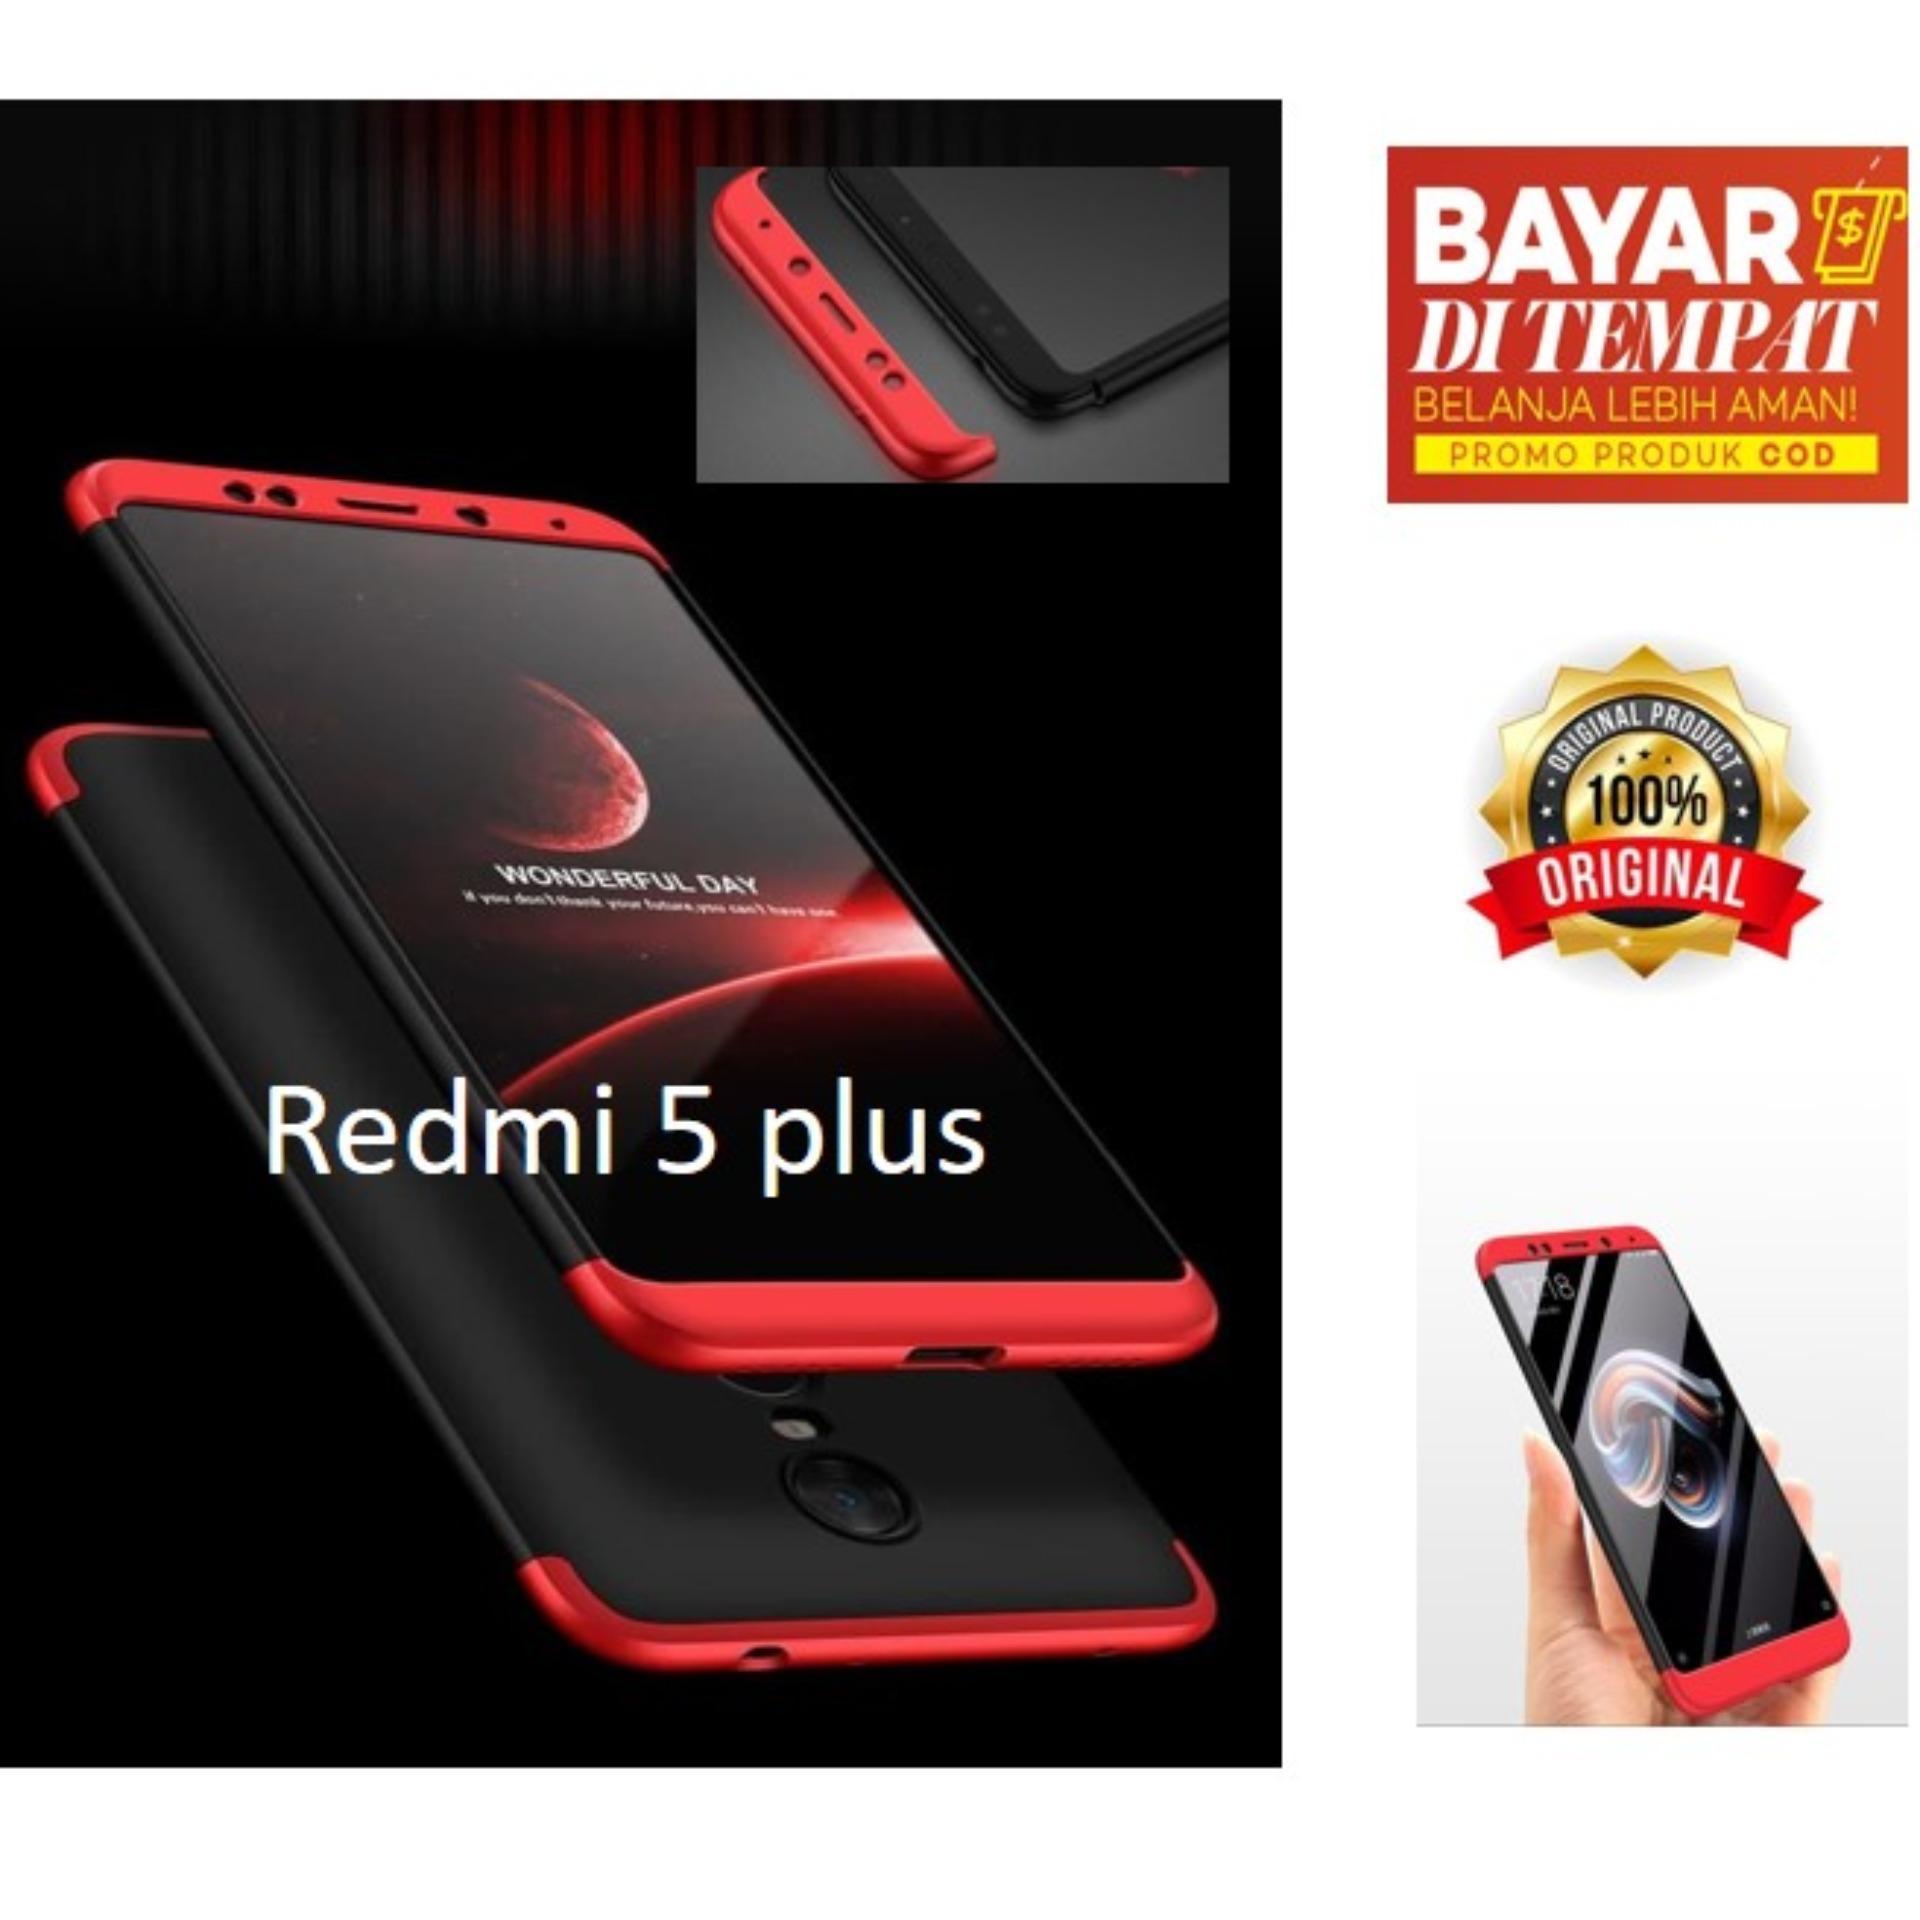 Case 360 Hardcase Premium Front Back 360 Degree Full Protection Case Quality Grade A for Xiaomi Redmi 5 Plus/CASE 360 PREMIUM  FULL DEPAN BELAKANG  UNTUK XIAOMI REDMI 5 PLUS/ REDMI NOTE 5 PLUS - HITAM LIST MERAH